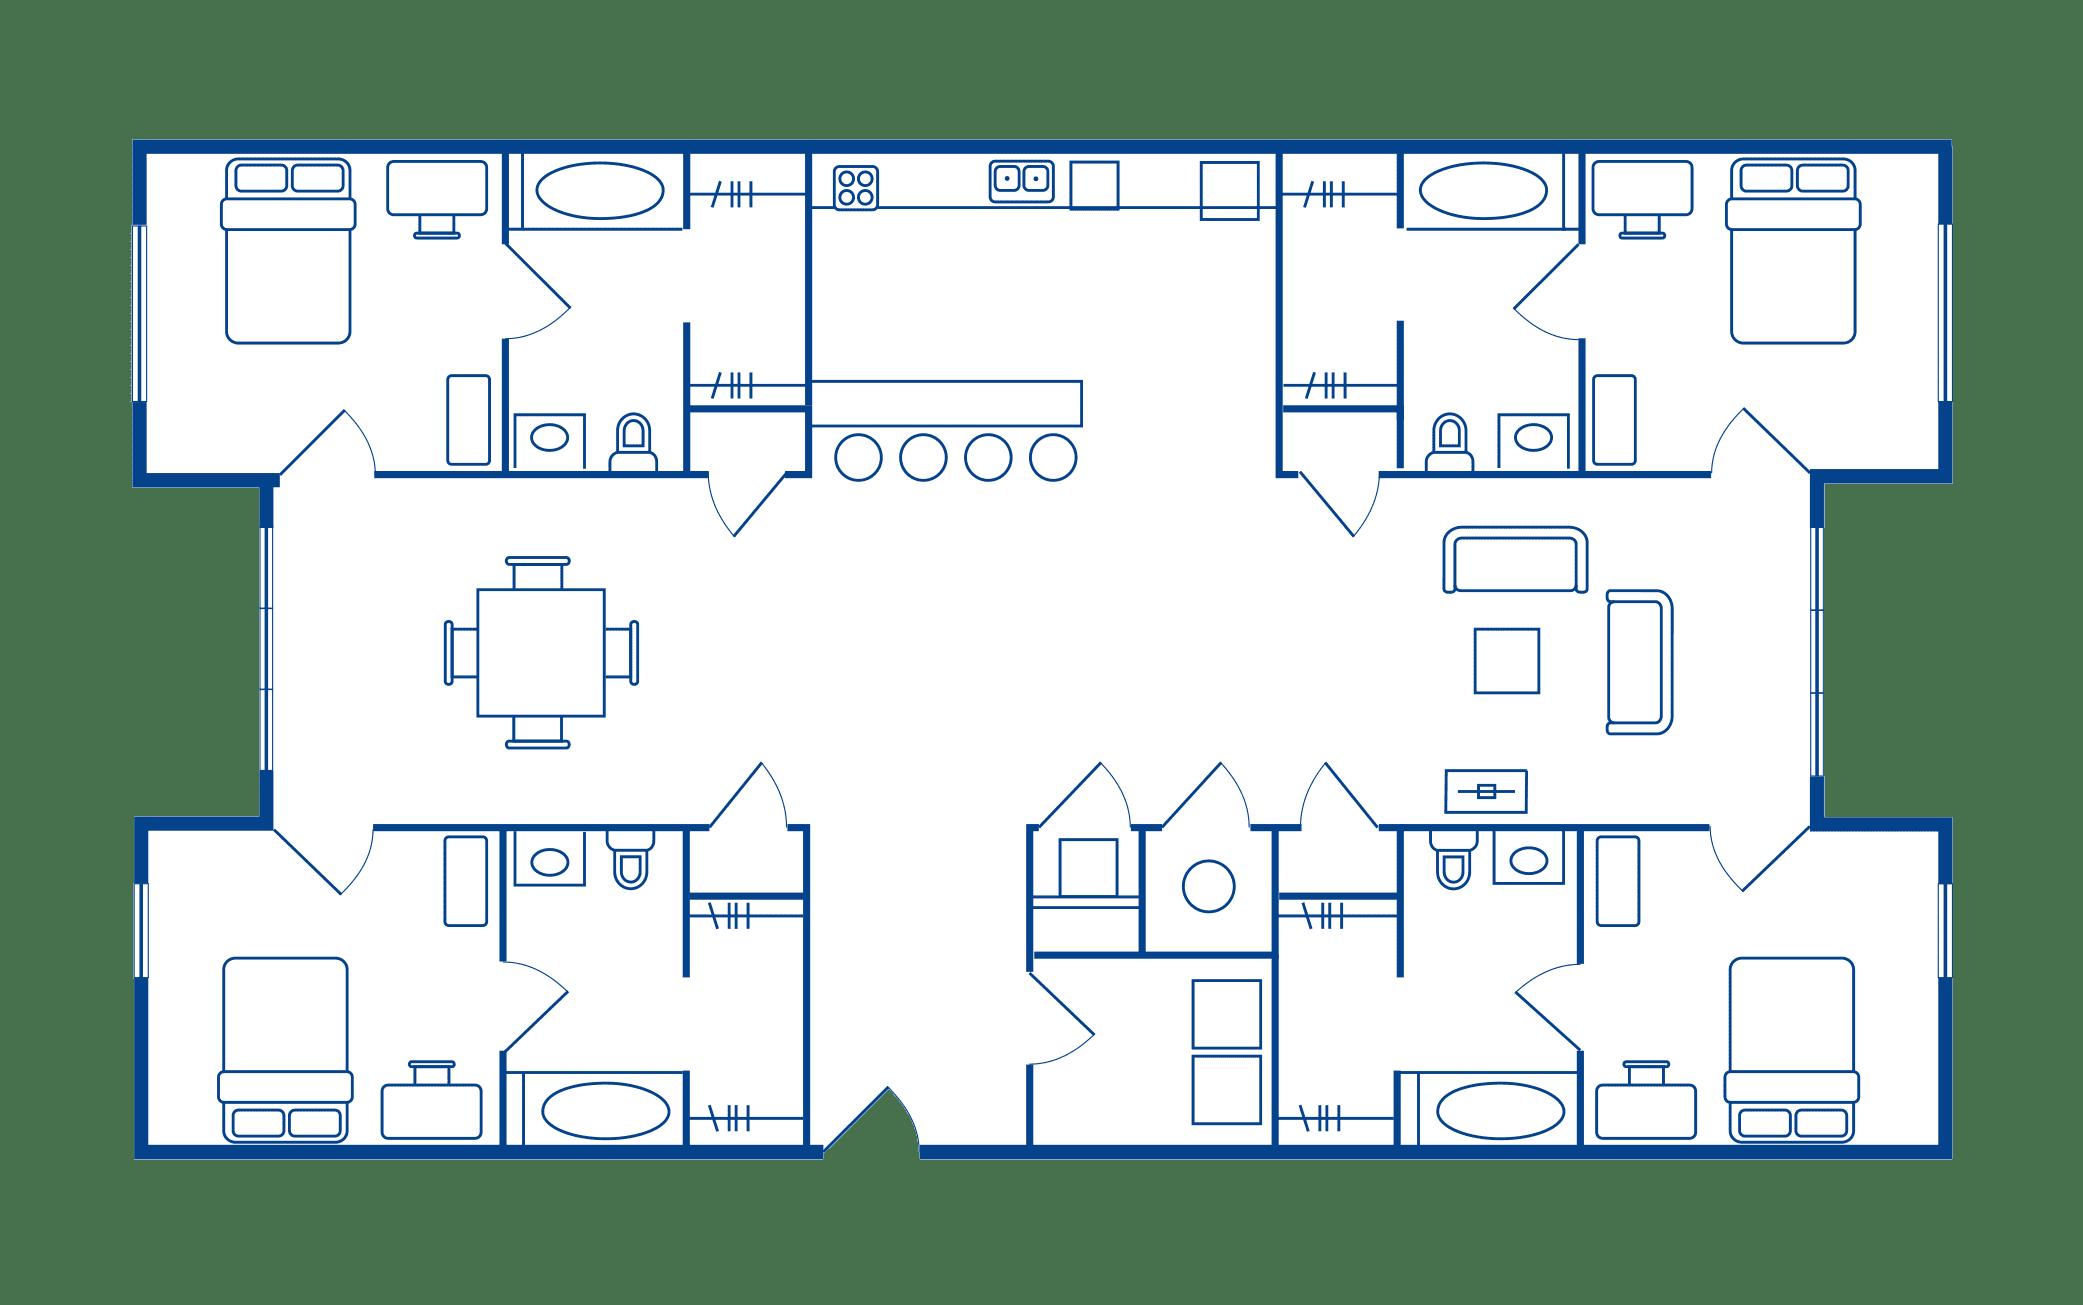 4 Bedroom & 4 Bath Apartments Near Sacramento